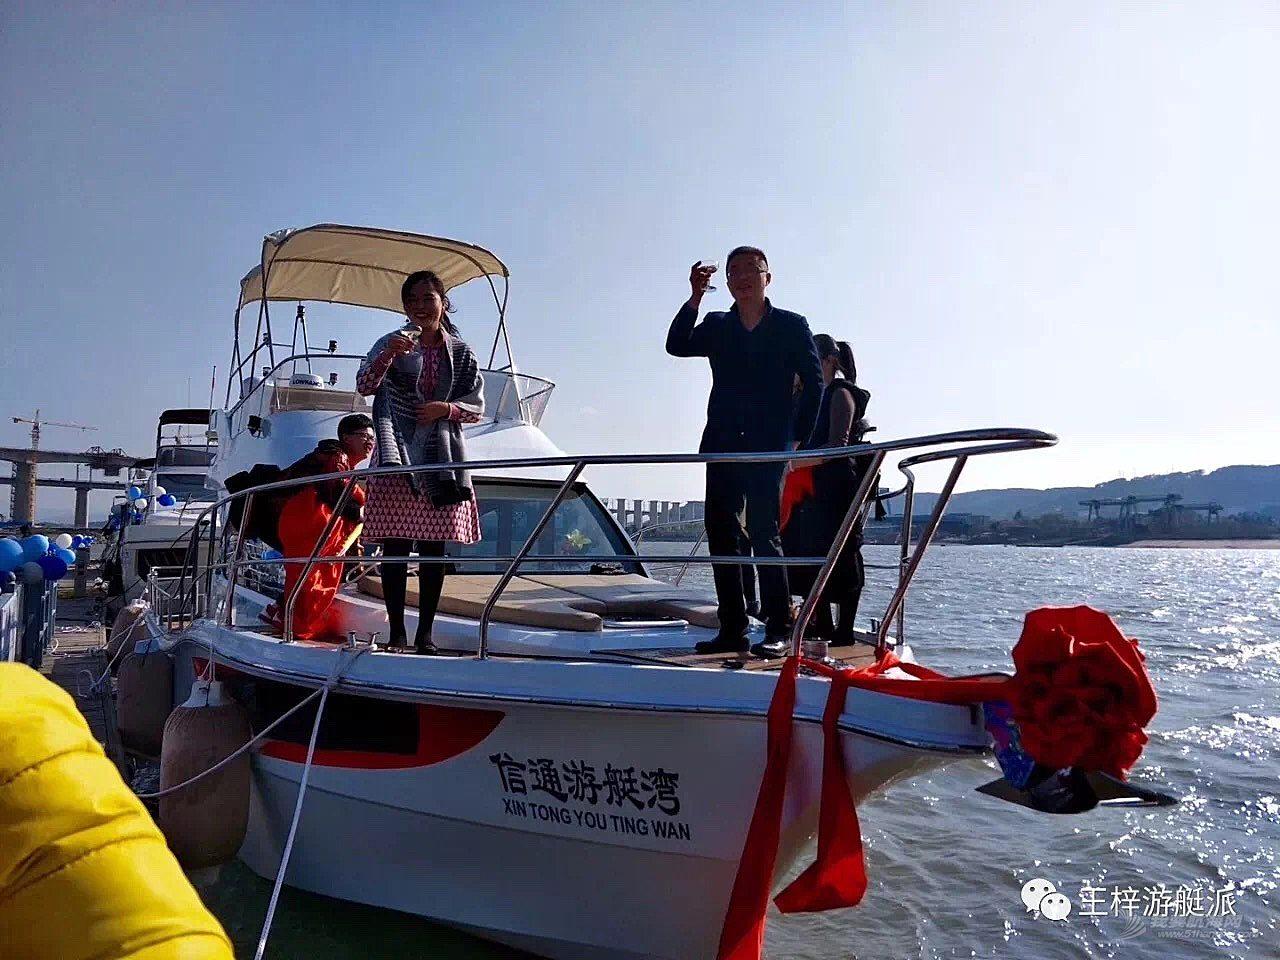 Wangs 王梓游艇 43呎飞桥休闲艇信通号交付使用